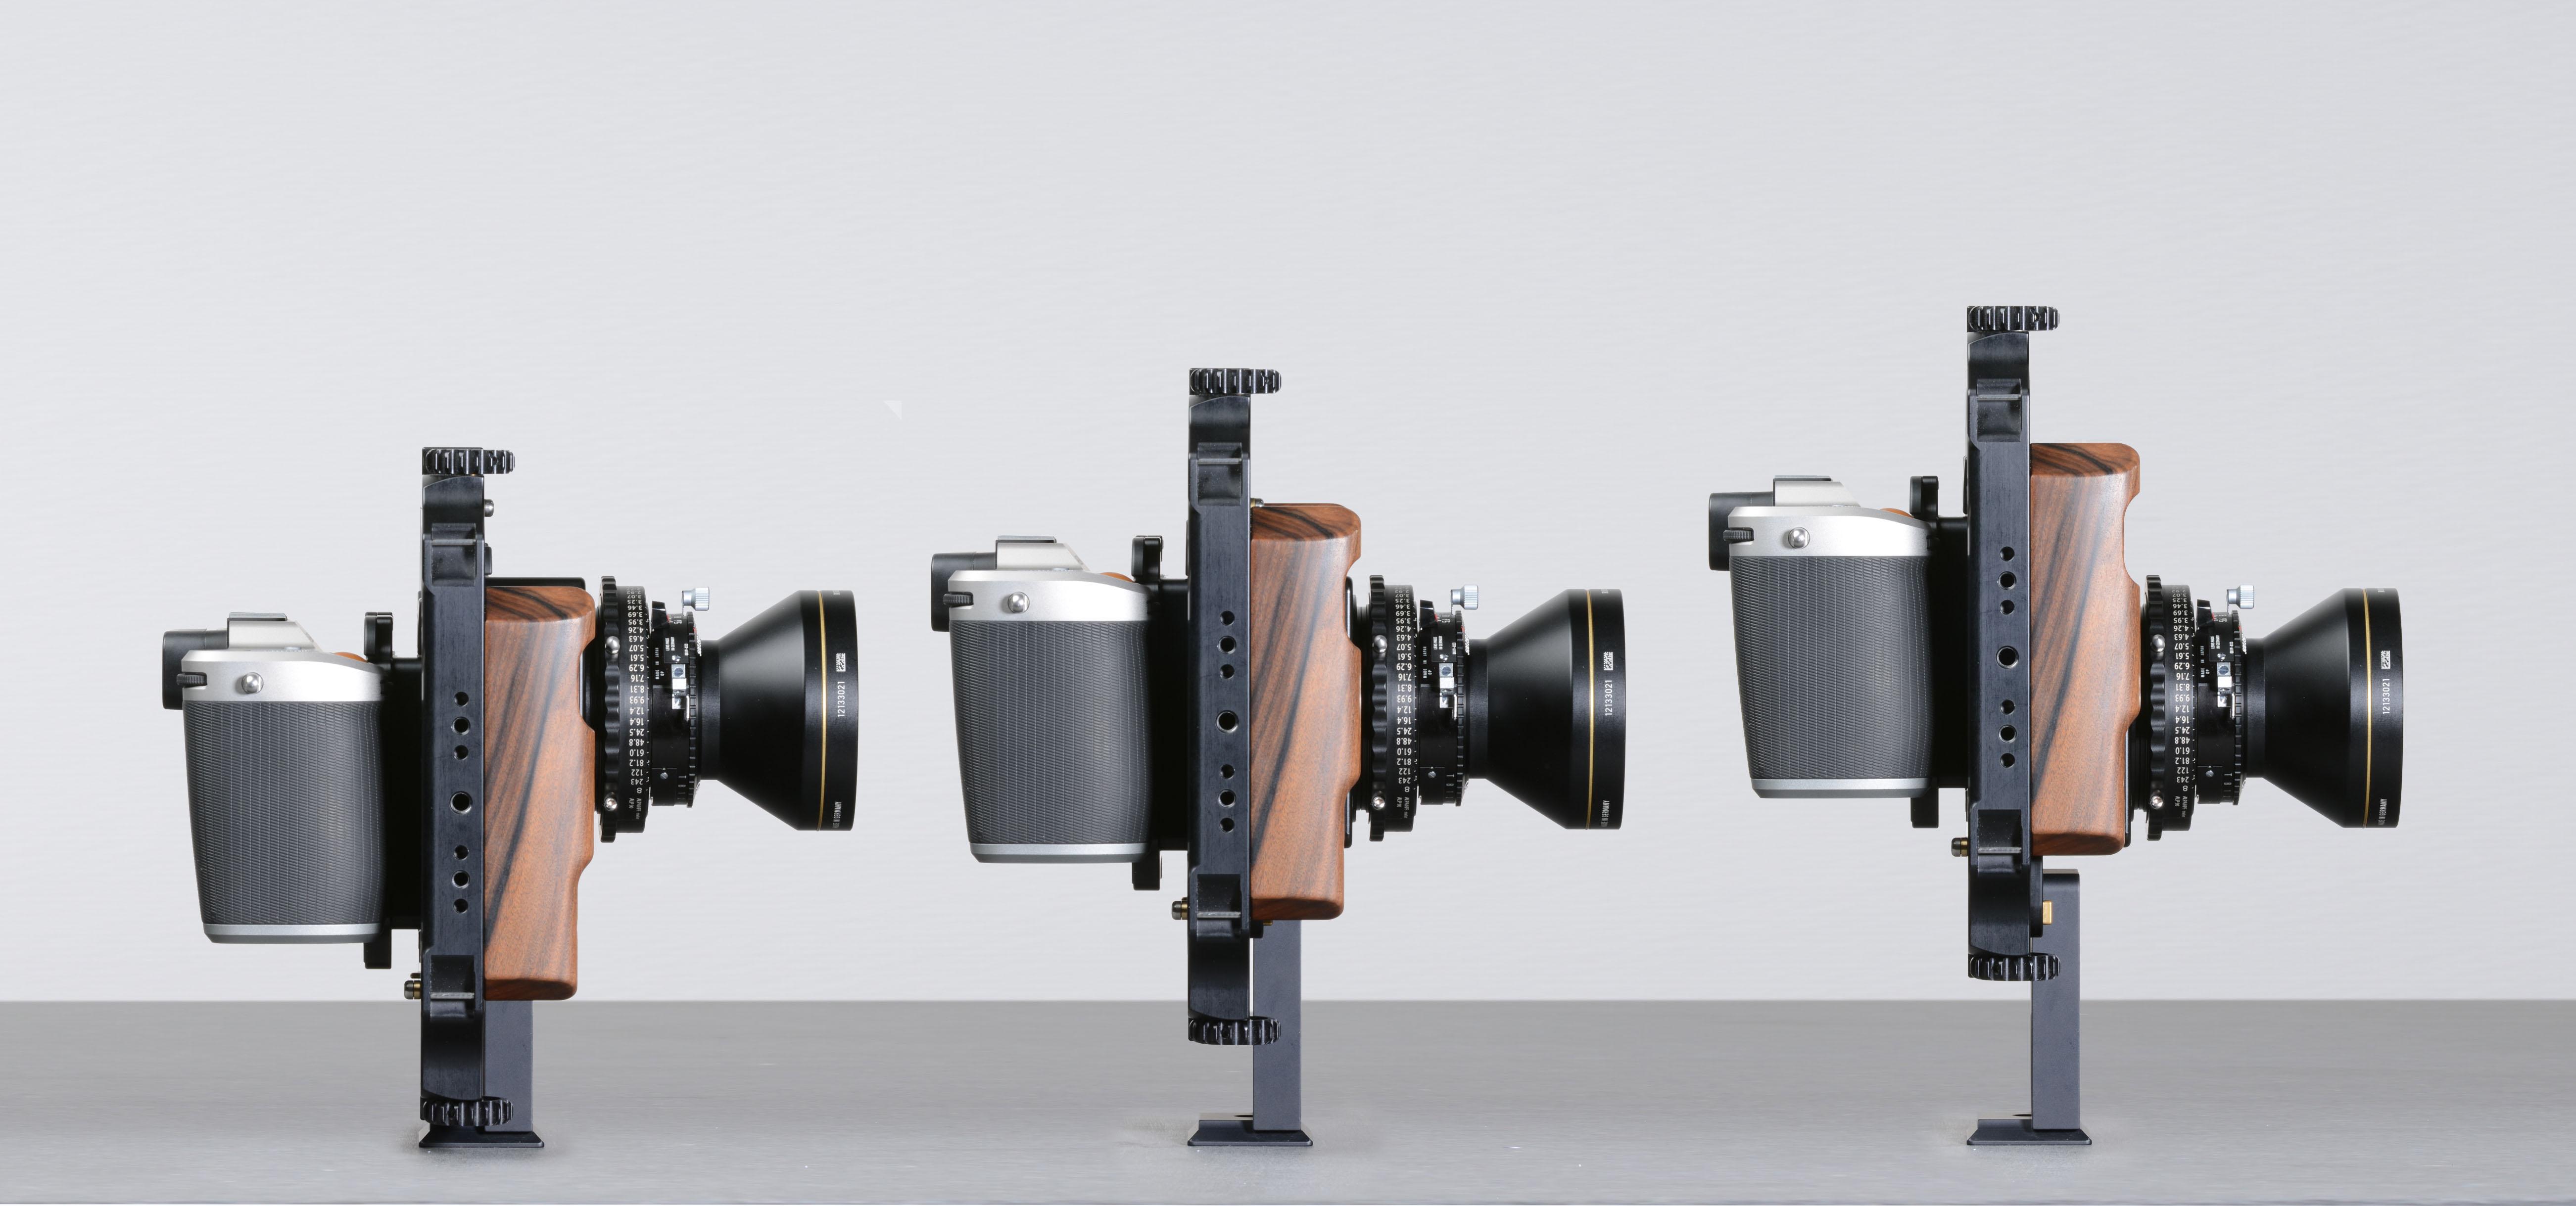 Hasselblad H1D on ALPA 12 MAX with HR ALPAGON 5.6/90 mm